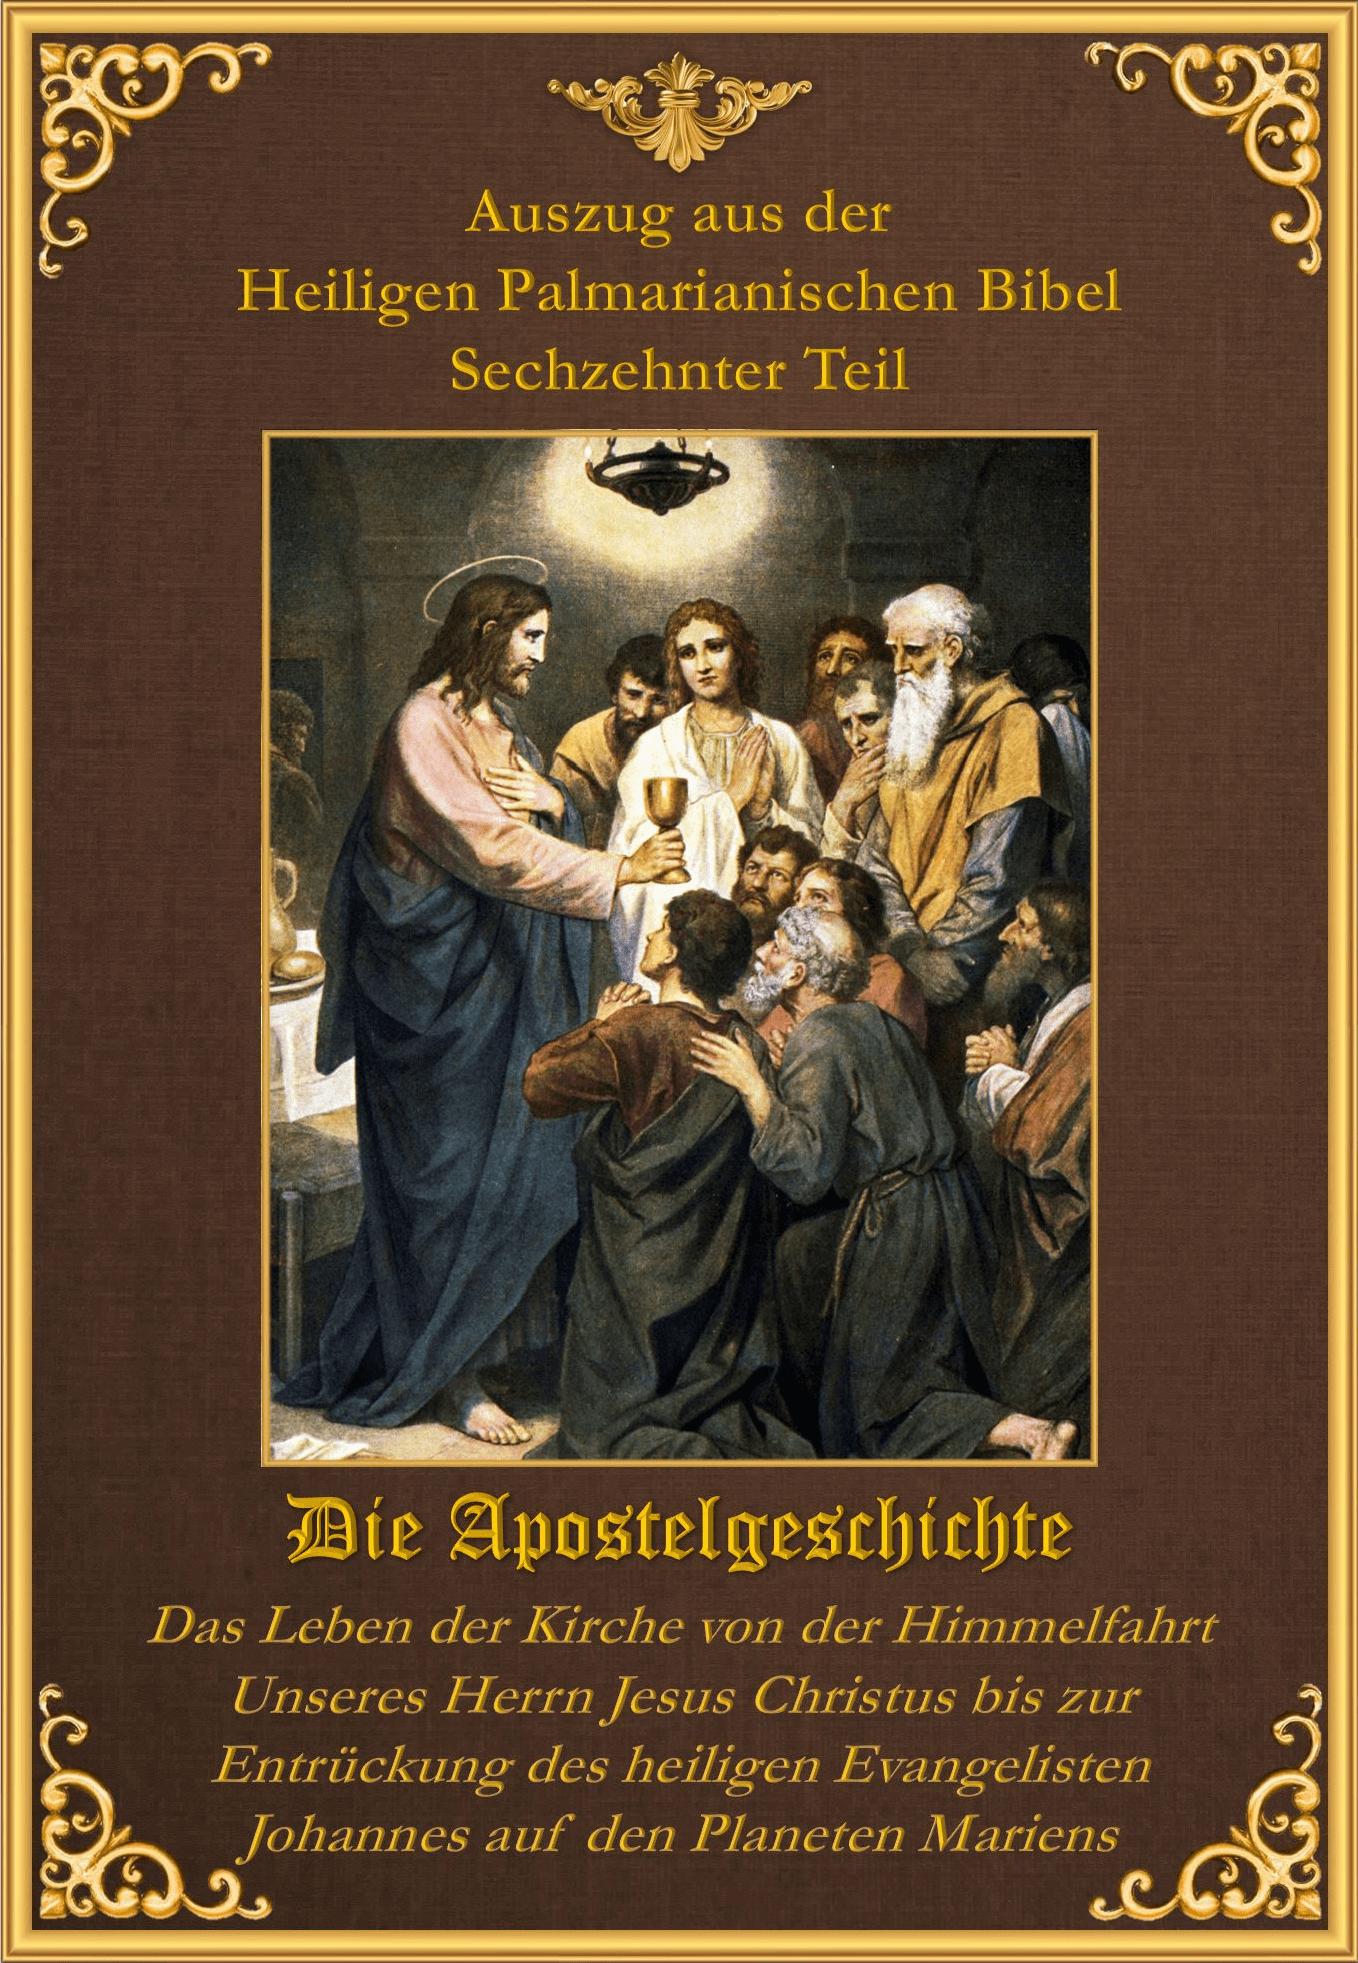 "<a href=""https://www.palmarianischekirche.org/wp-content/uploads/2019/08/Bible-Sechzehnter-Teil.pdf"" title=""Die Apostelgeschichte"">Die Apostelgeschichte<br><br>Mehr"